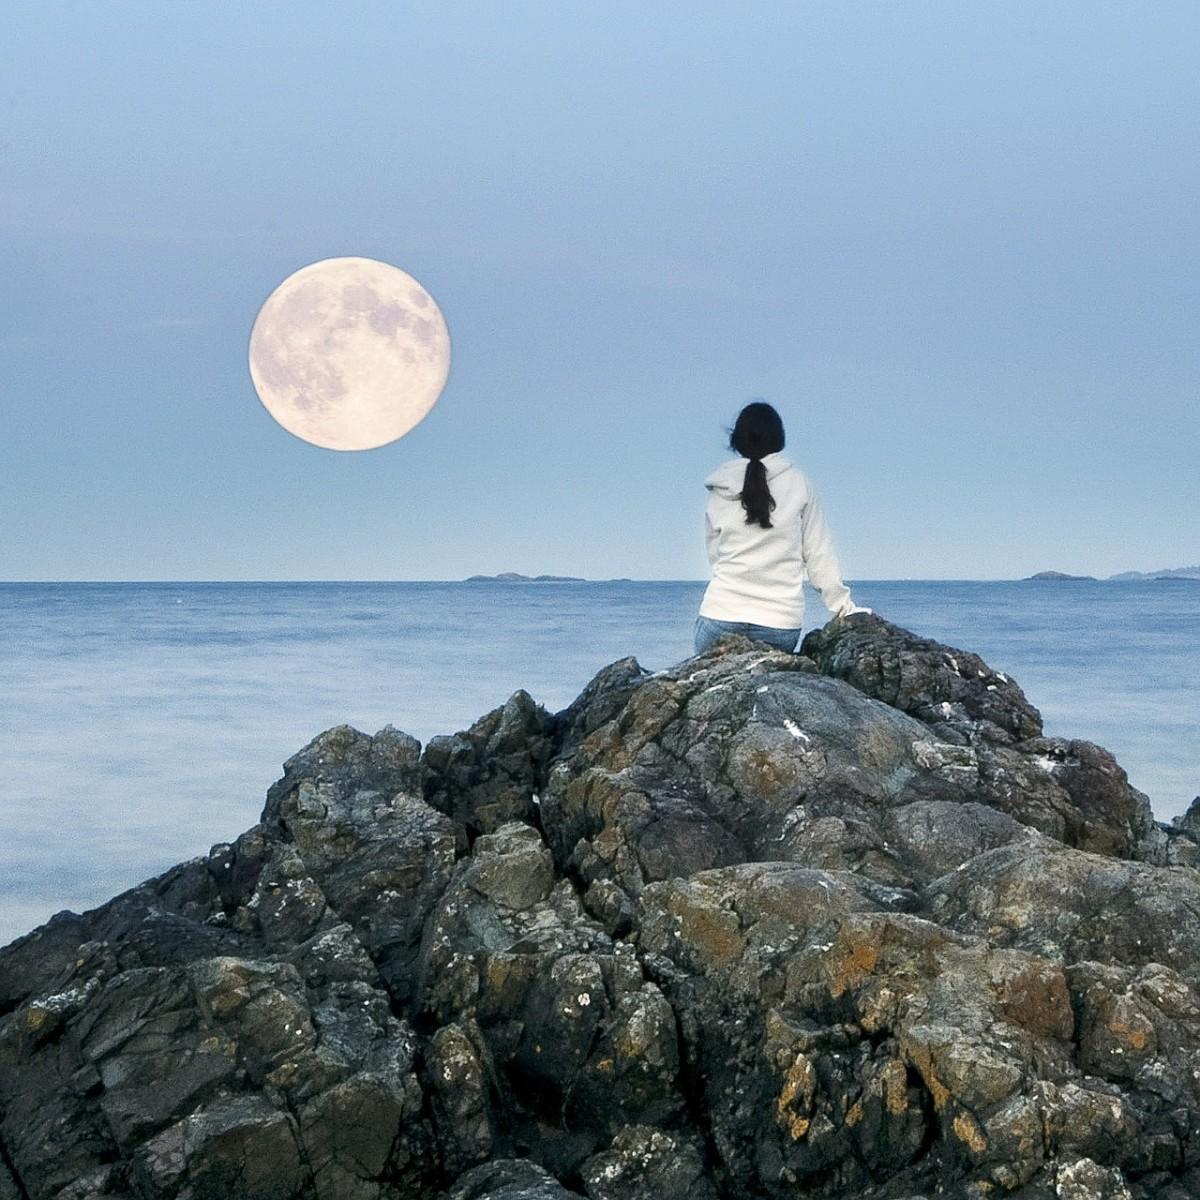 Full moon by the Ocean